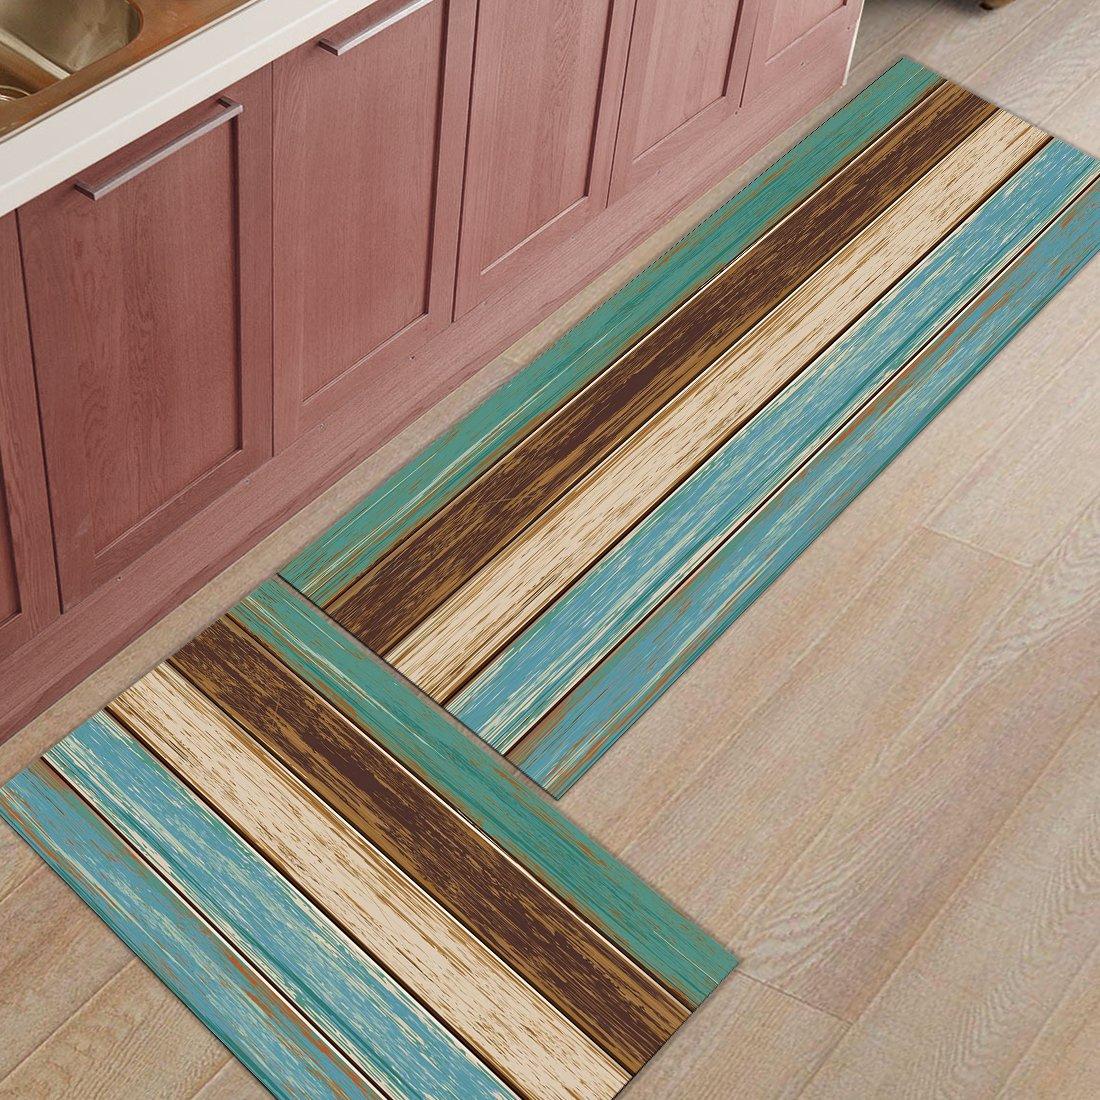 Infinidesign 2 Piece Kitchen Rubber Backing Non-Slip Bath Rugs Runner Doormat Set - Wood Grain Runner Carpet Set - 23.6''x35.4''+23.6''x70.9''